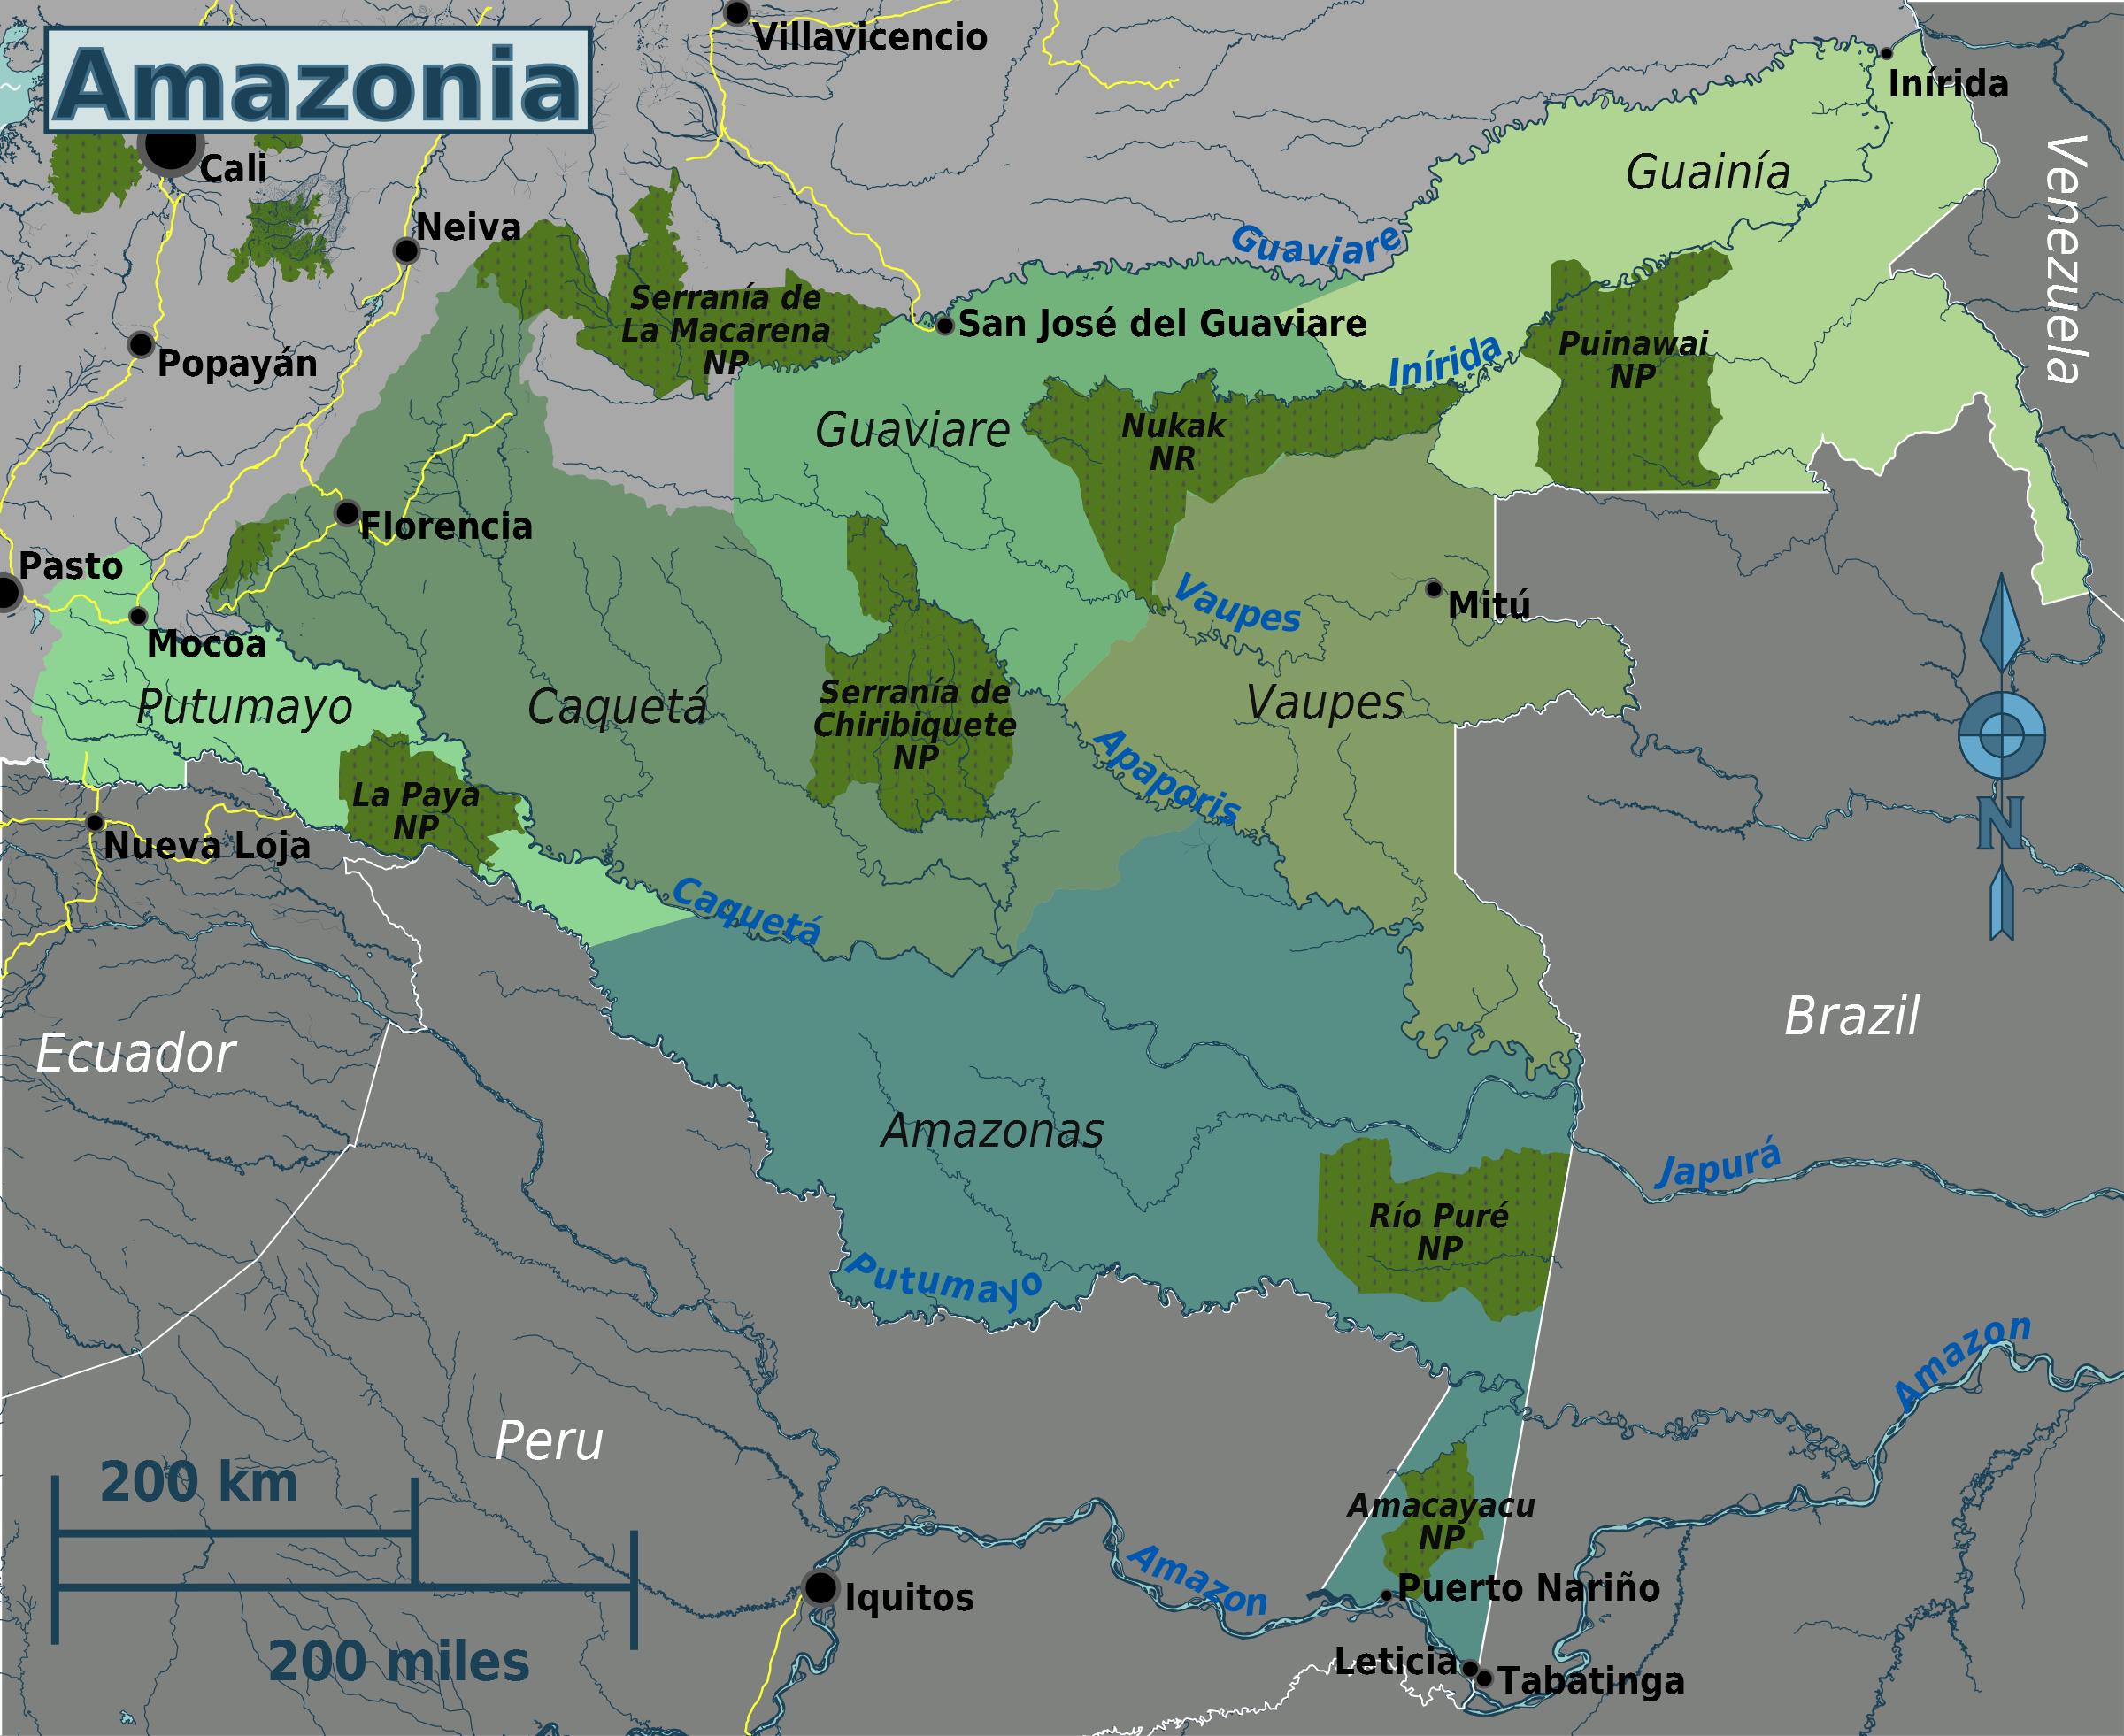 FileColombian Amazonia regions mappng  Wikimedia Commons